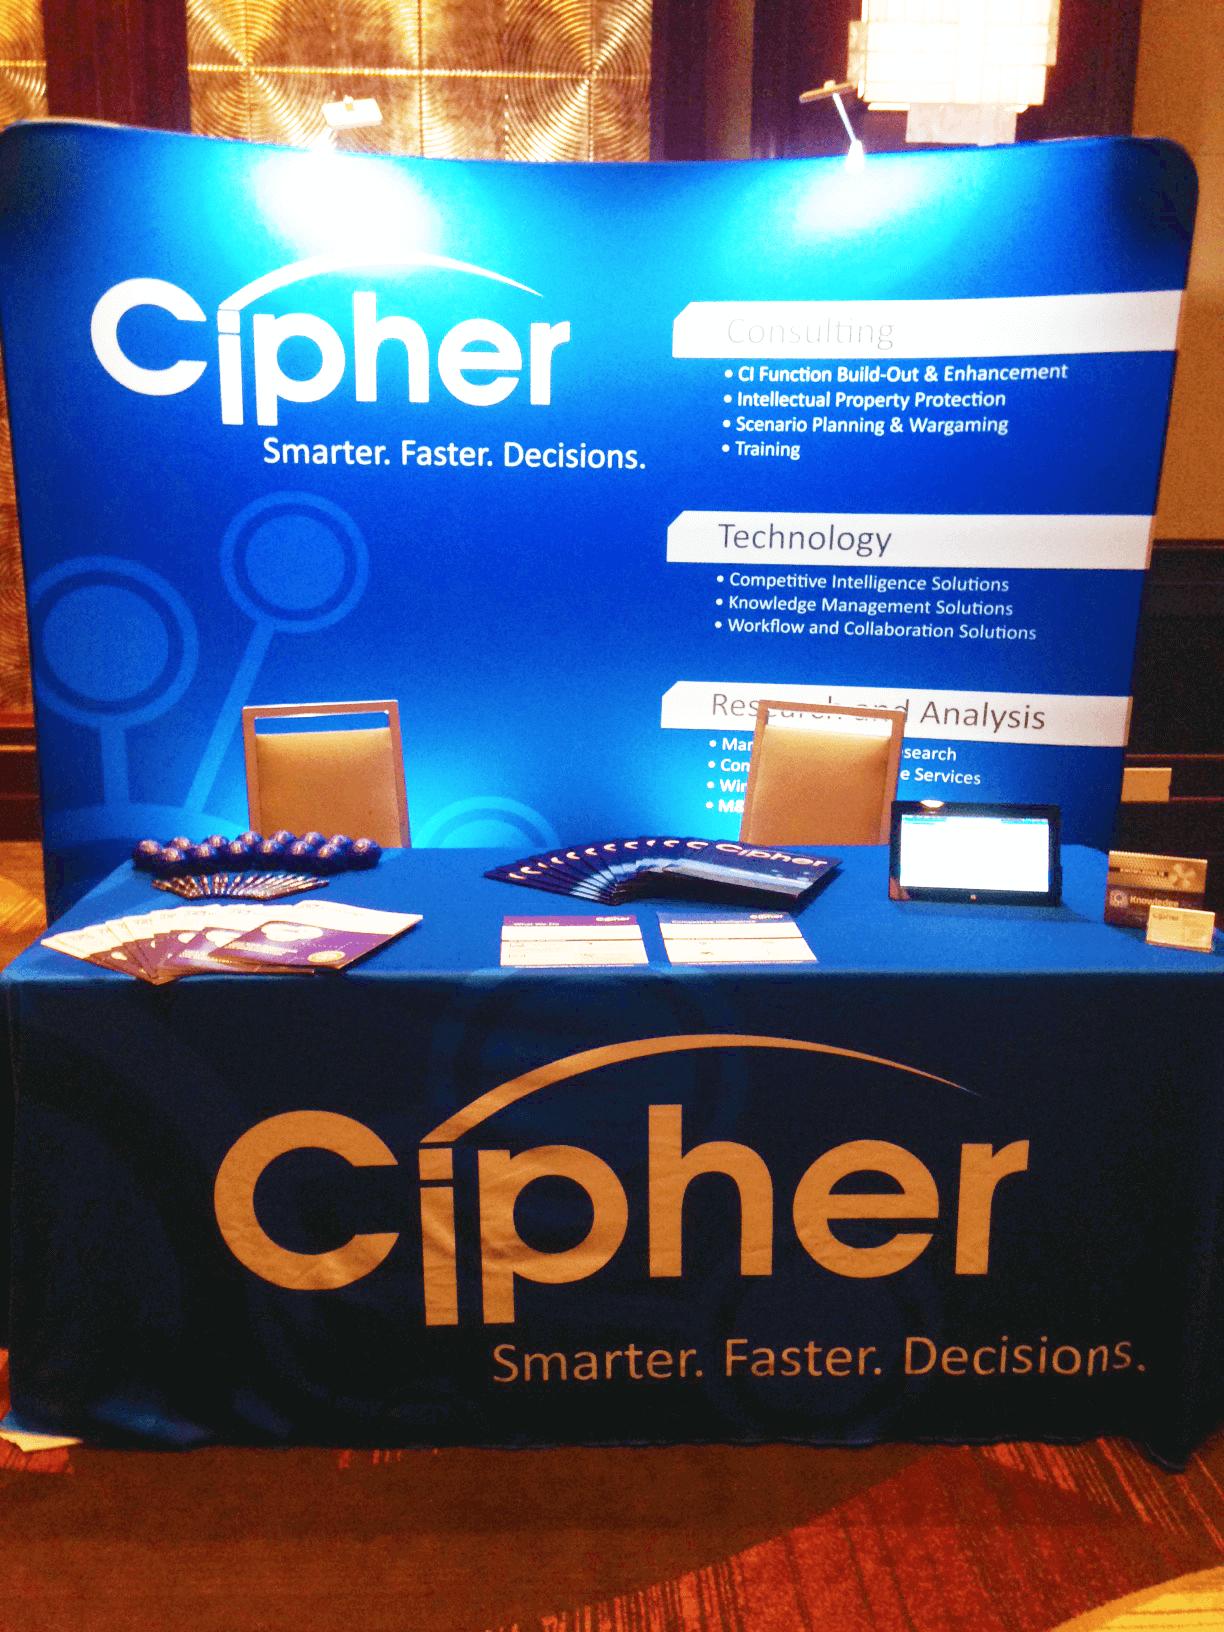 Cipher Sponsors Strategic Planning Innovation Summit in NYC Dec 5 6